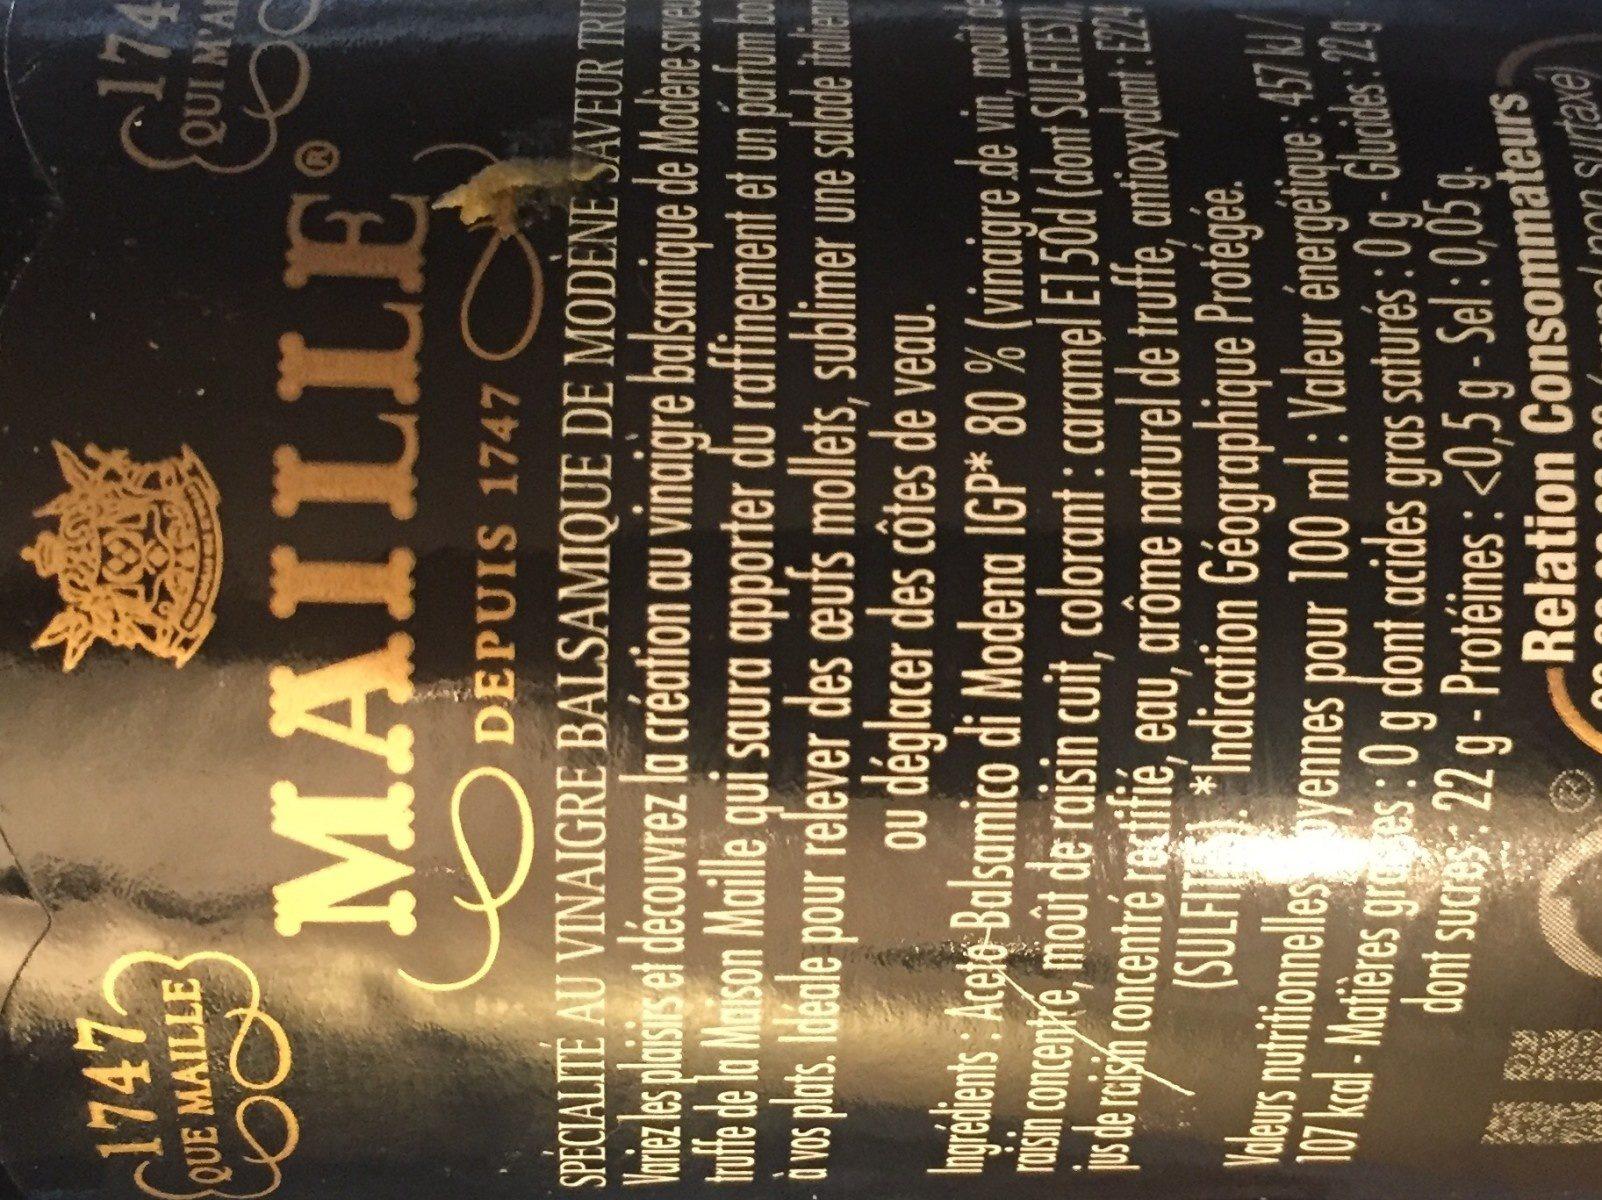 Maille Vinaigre Balsamique Saveur Truffe - Ingredients - fr